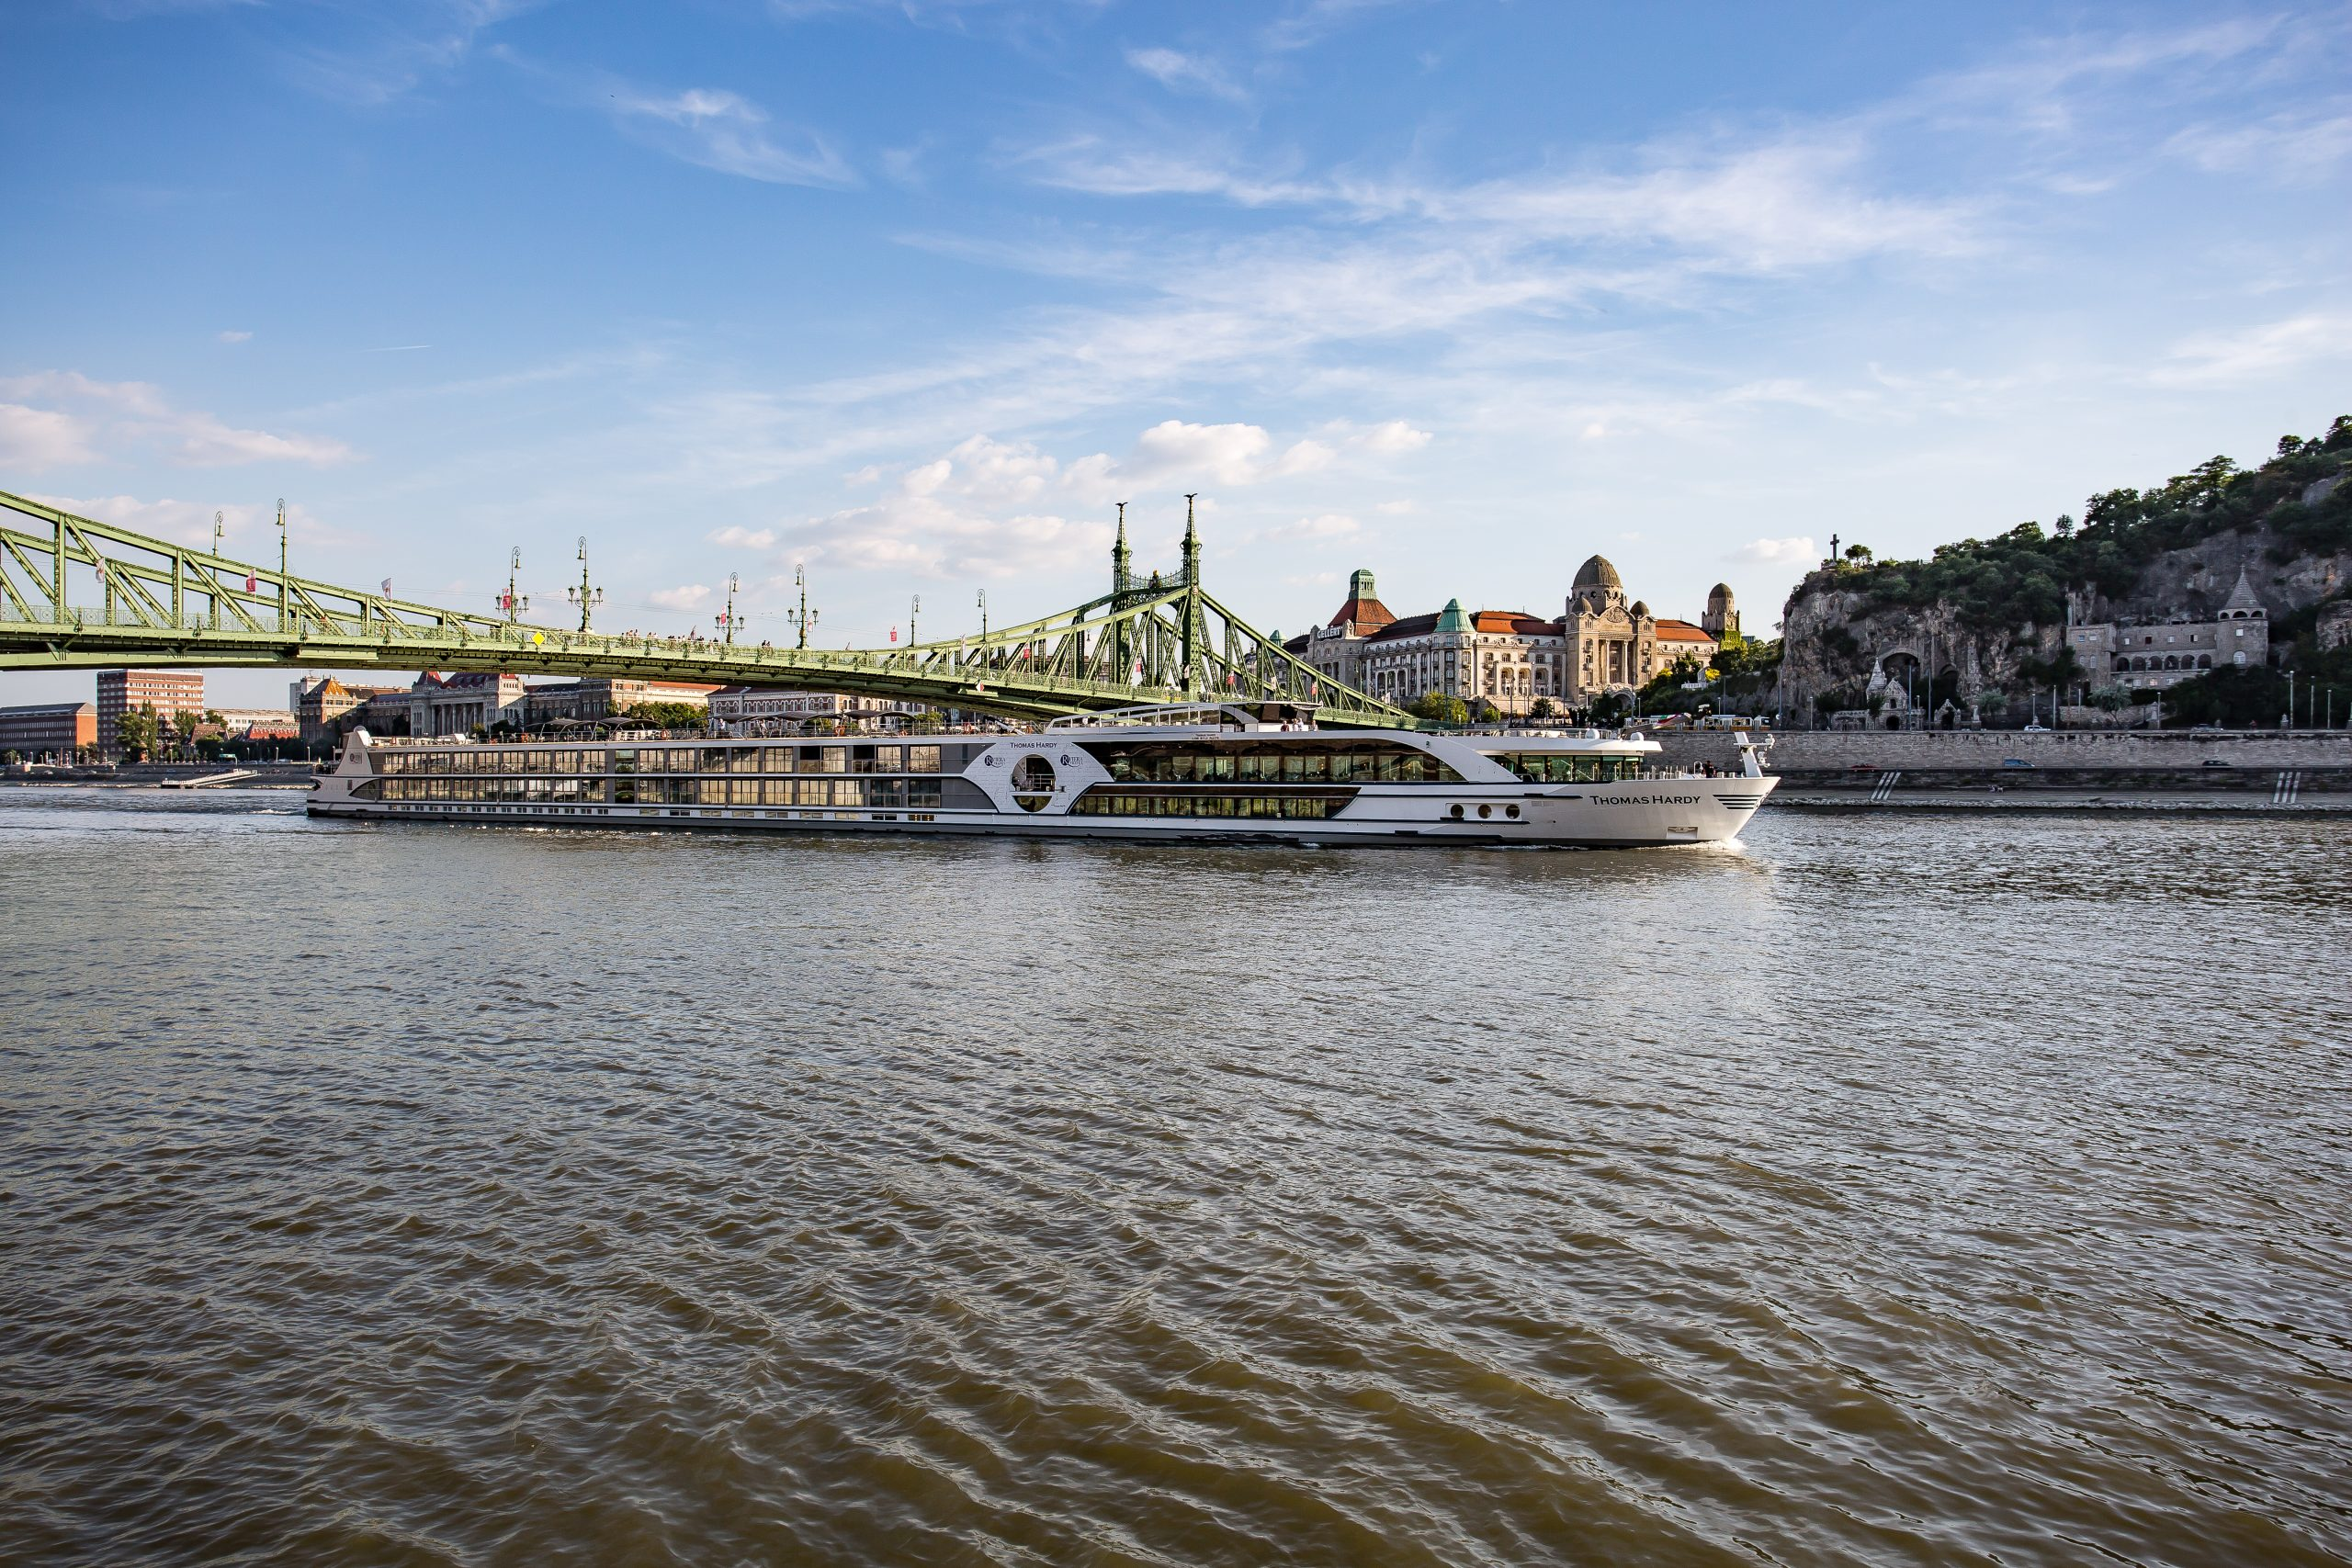 MS Thomas Hardy - Flusskreuzfahrten-Reisen